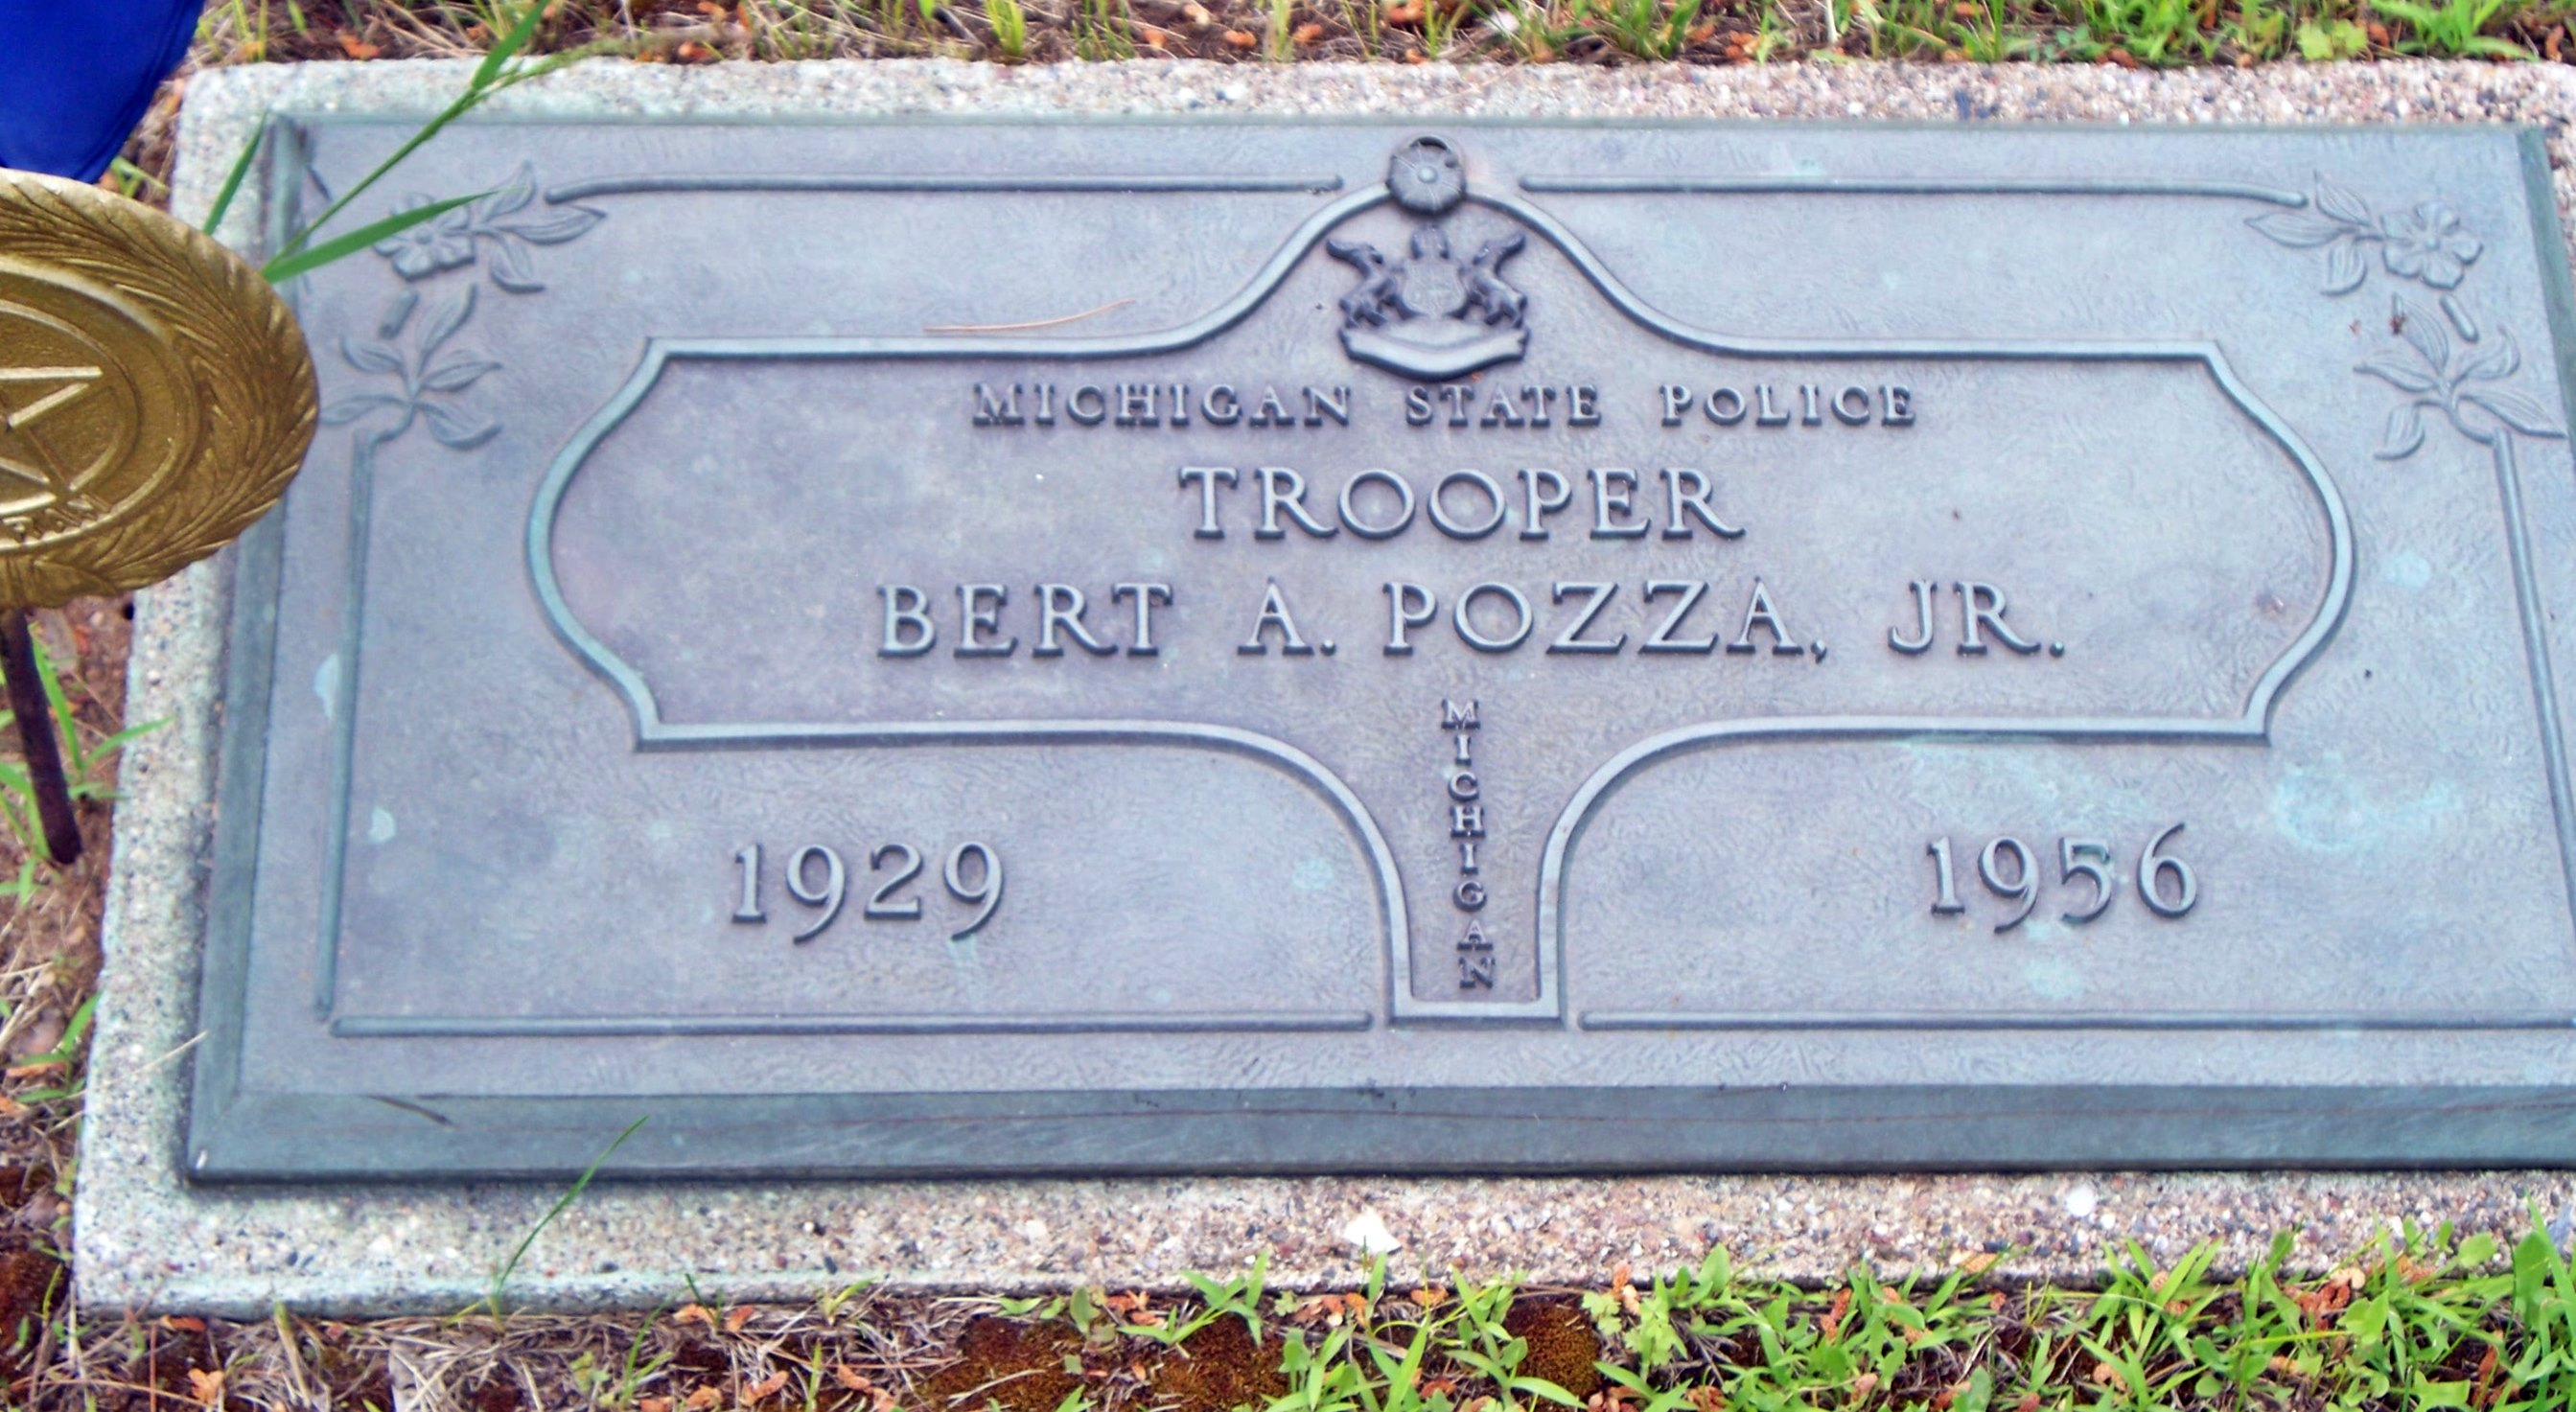 Trooper Bert Anthony Pozza | Michigan State Police, Michigan